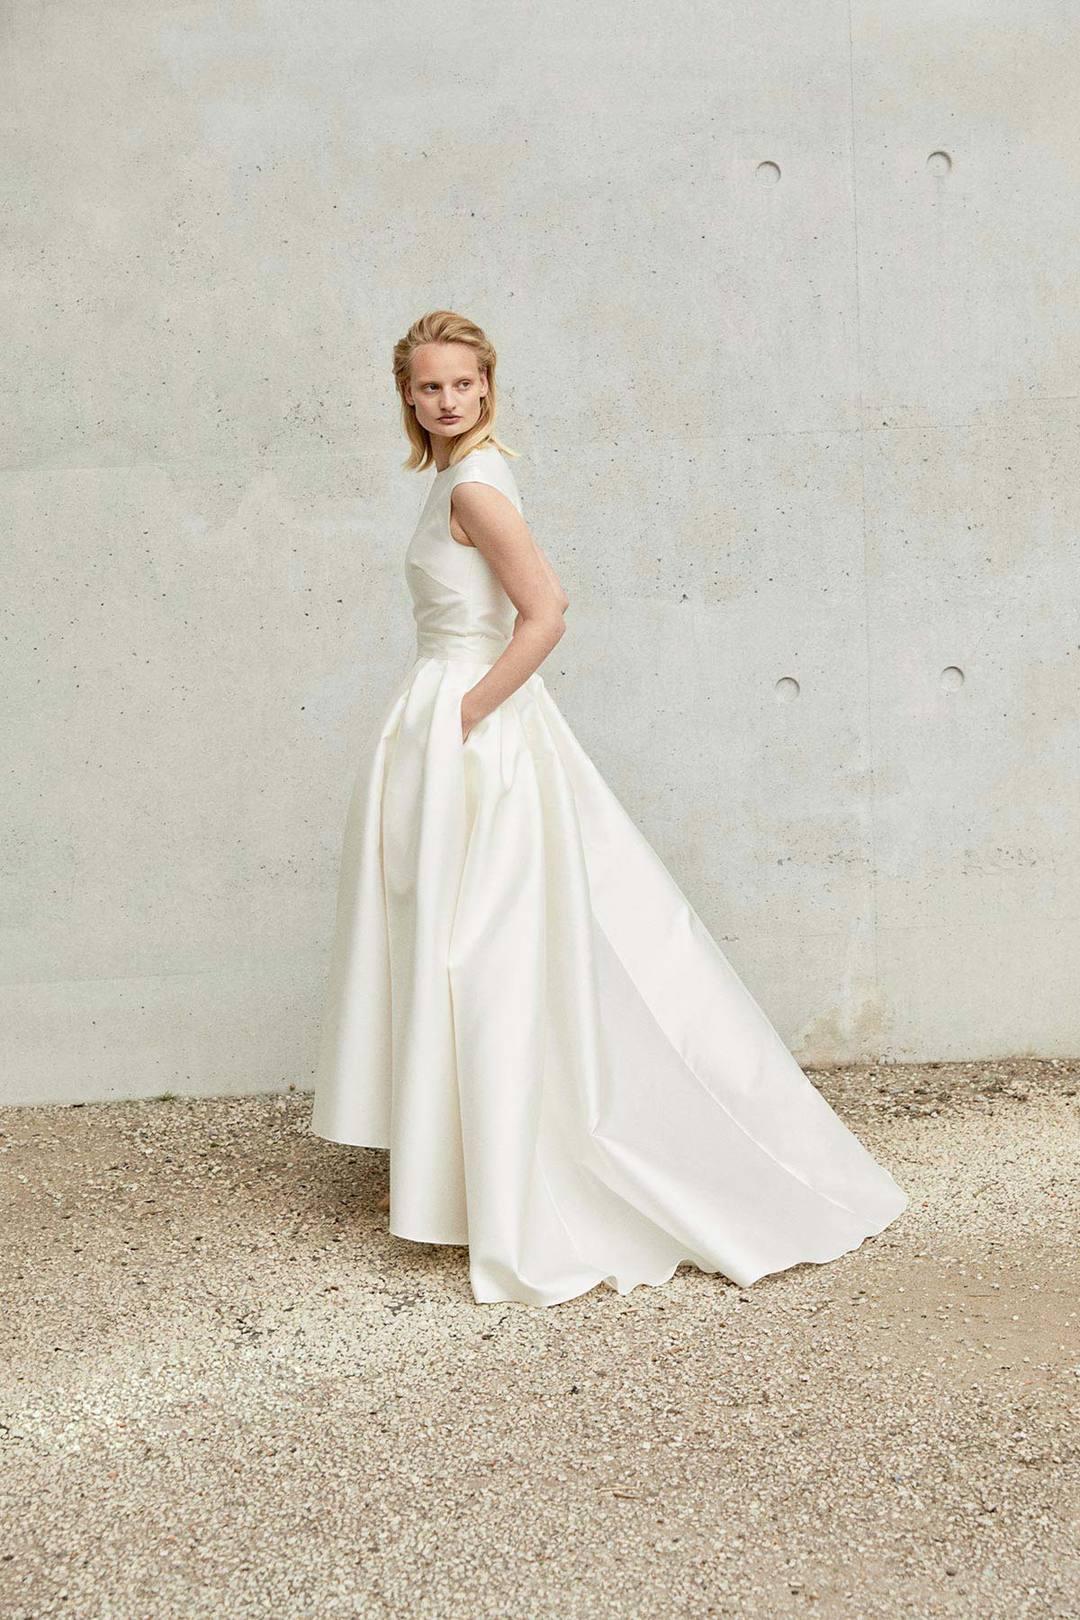 lilou skirt dress photo